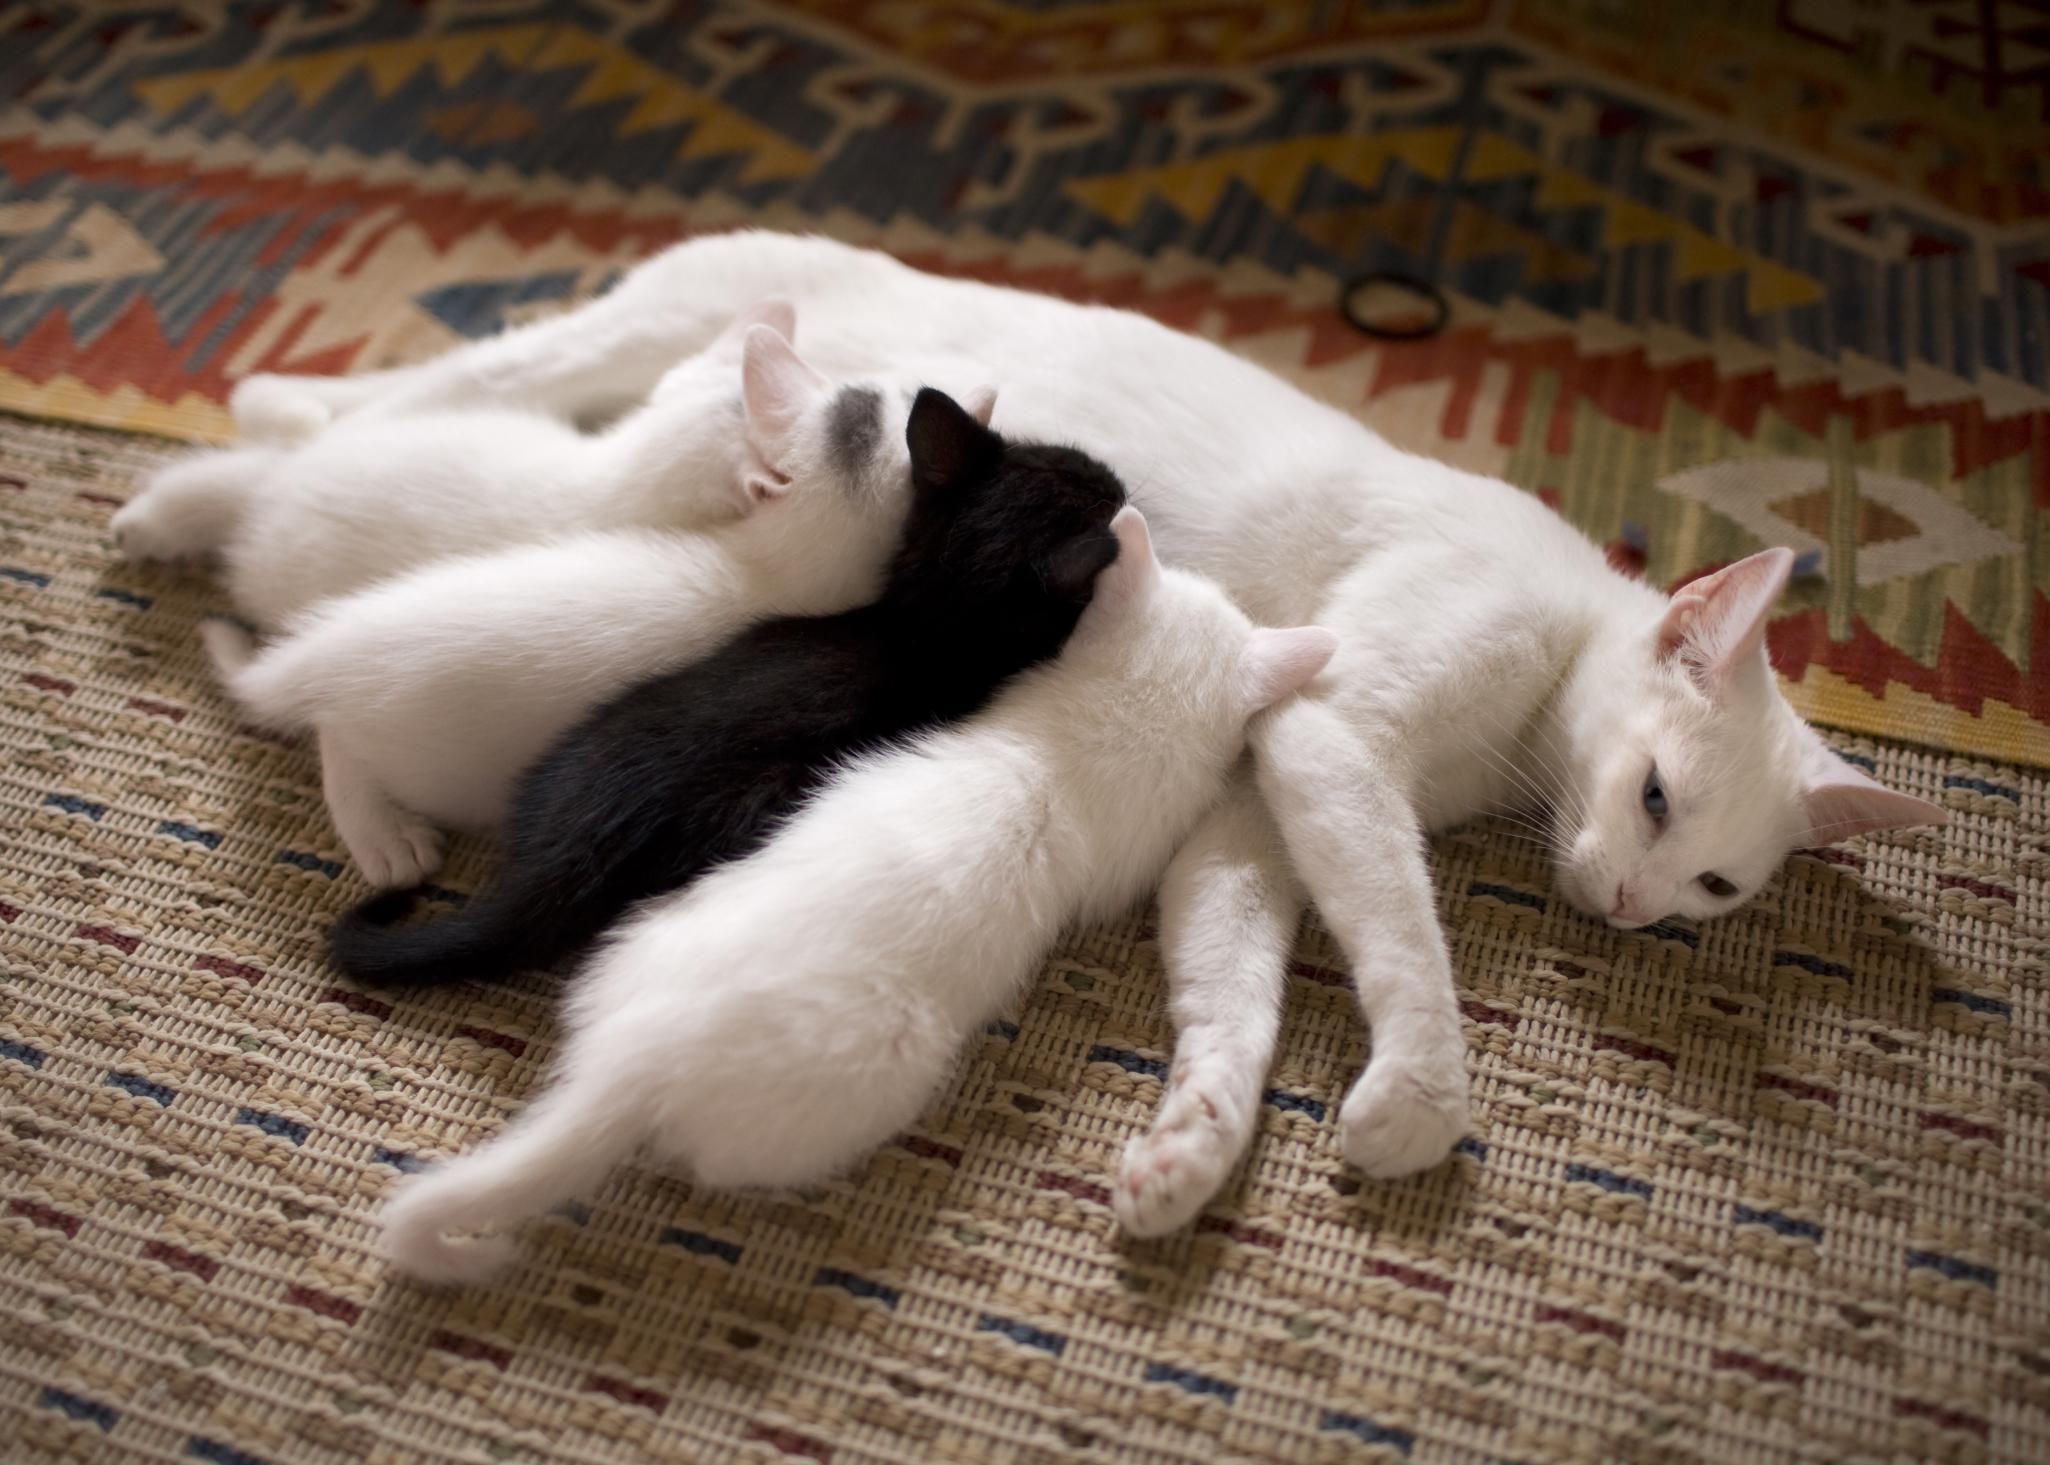 Learn Proper Post Natal Care For A Cat And Her Newborn Kittens Pregnant Cat Kitten Care Newborn Kittens